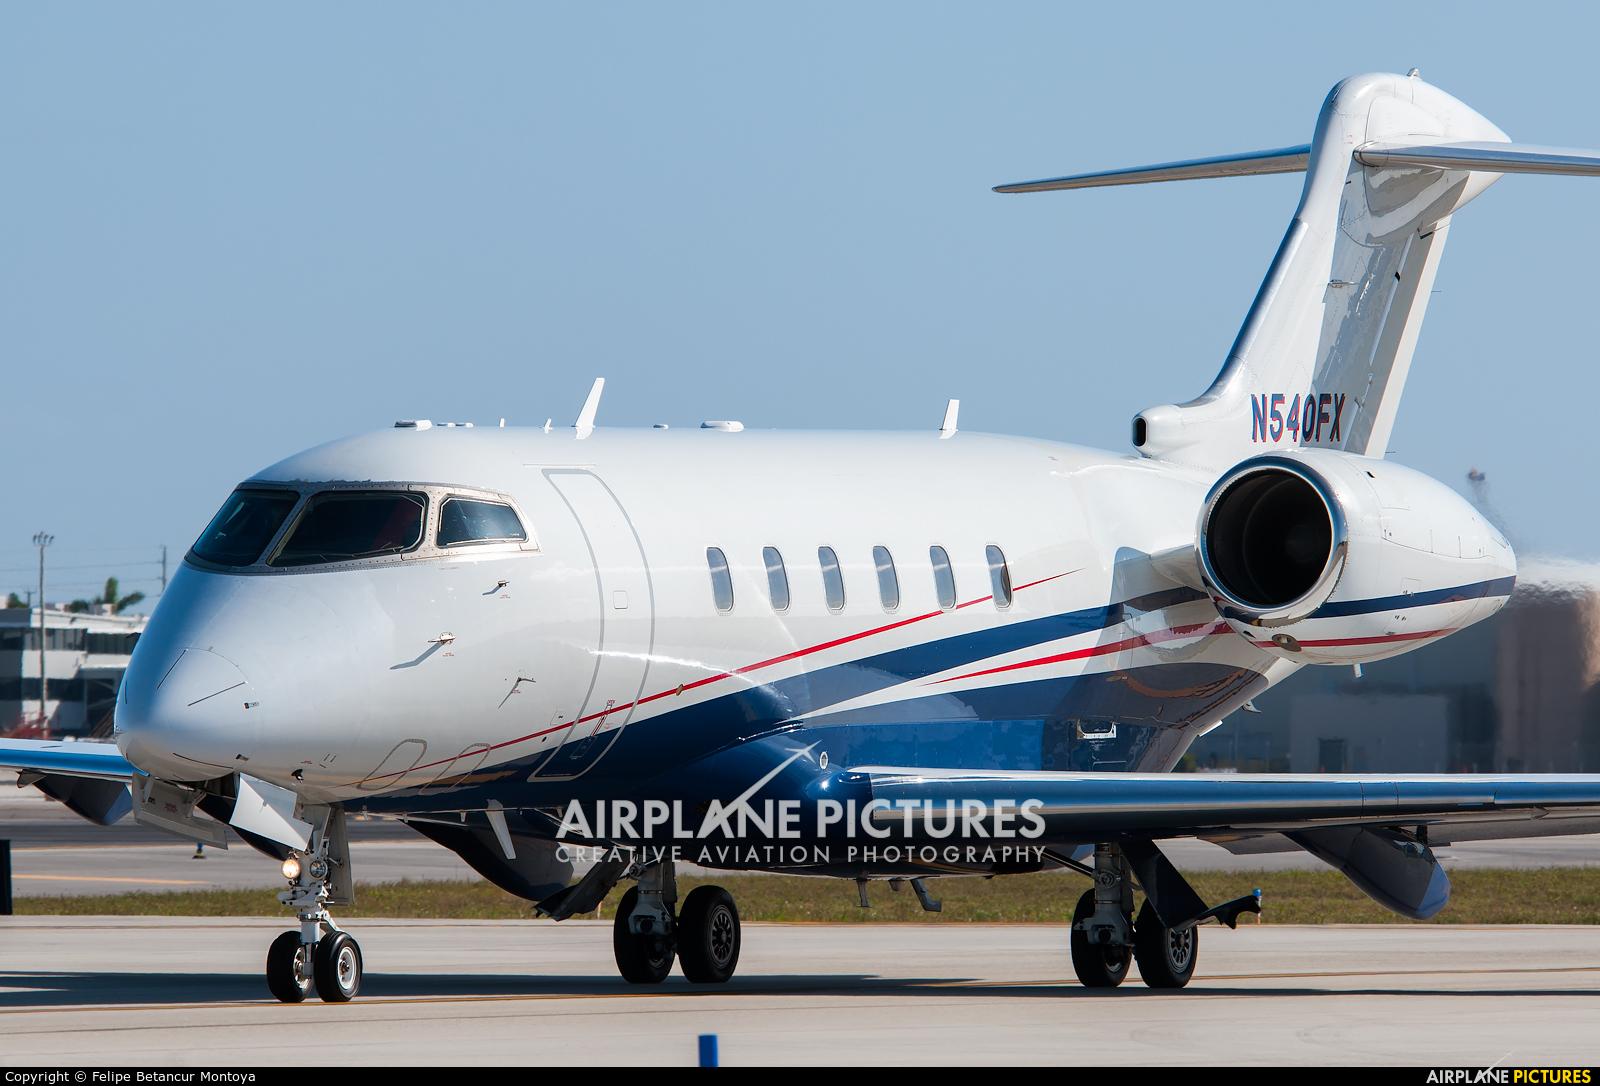 FlexJet N540FX aircraft at Fort Lauderdale - Hollywood Intl